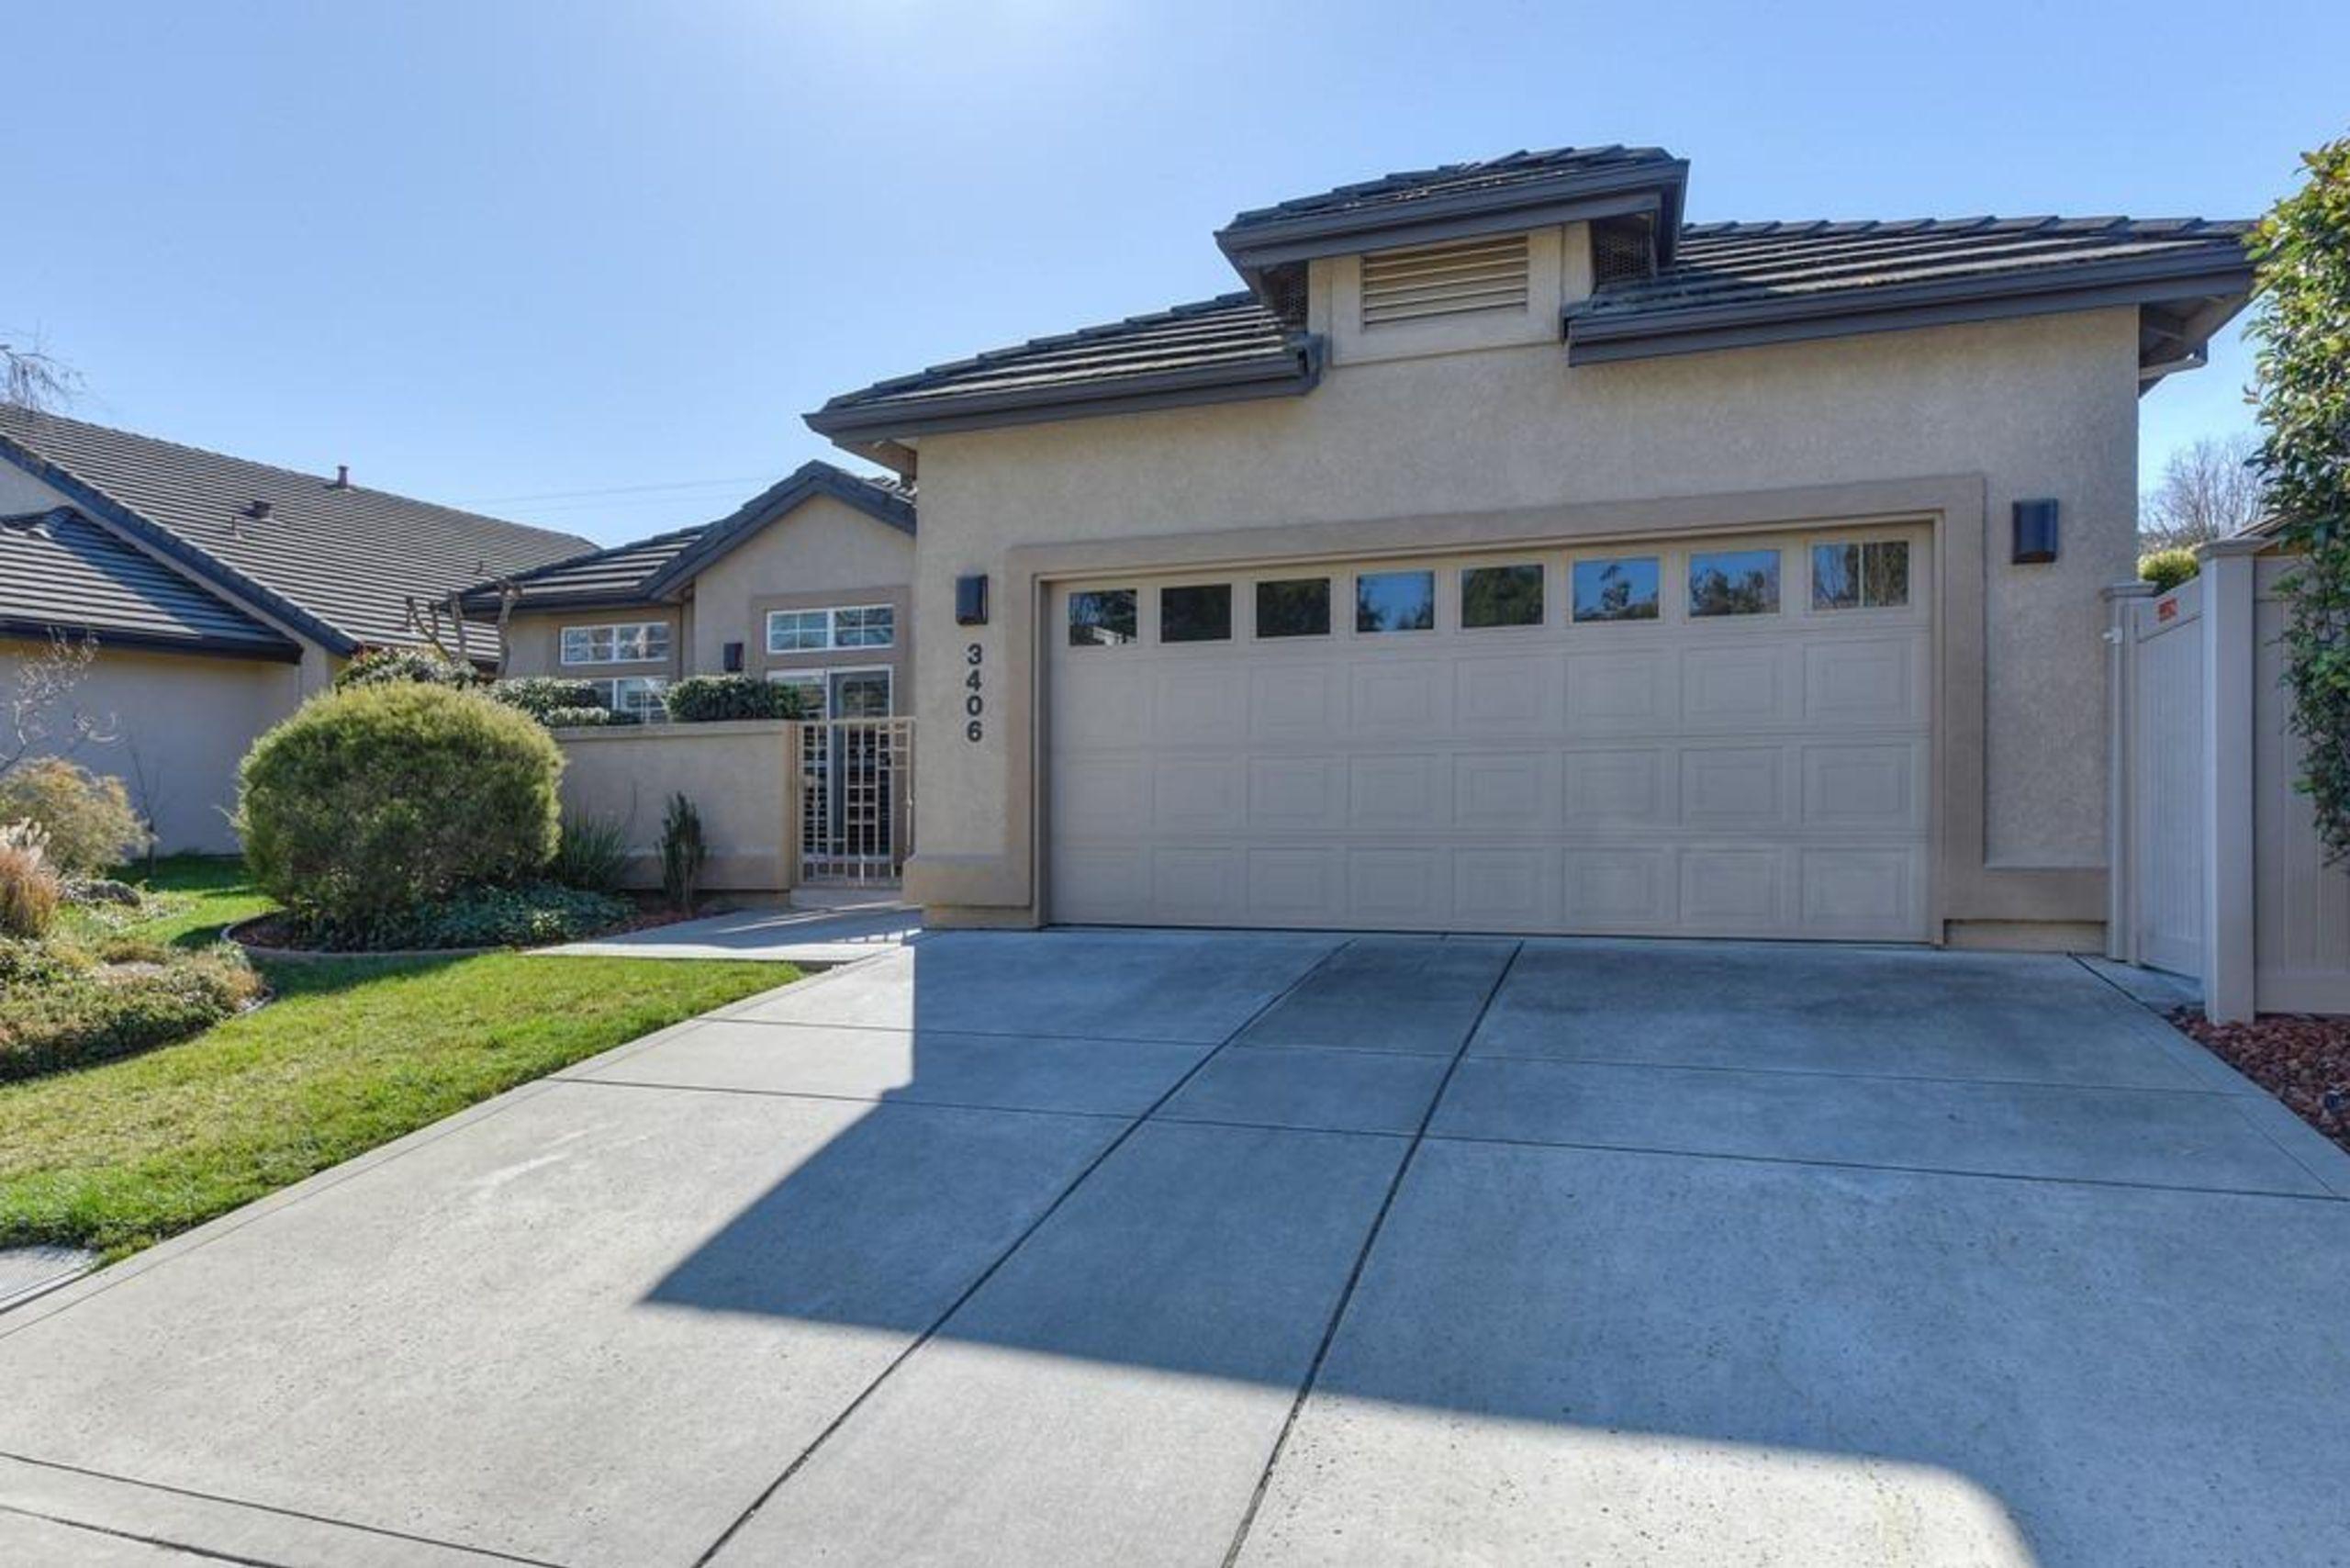 3406 MONO PLACE DAVIS | $798,000